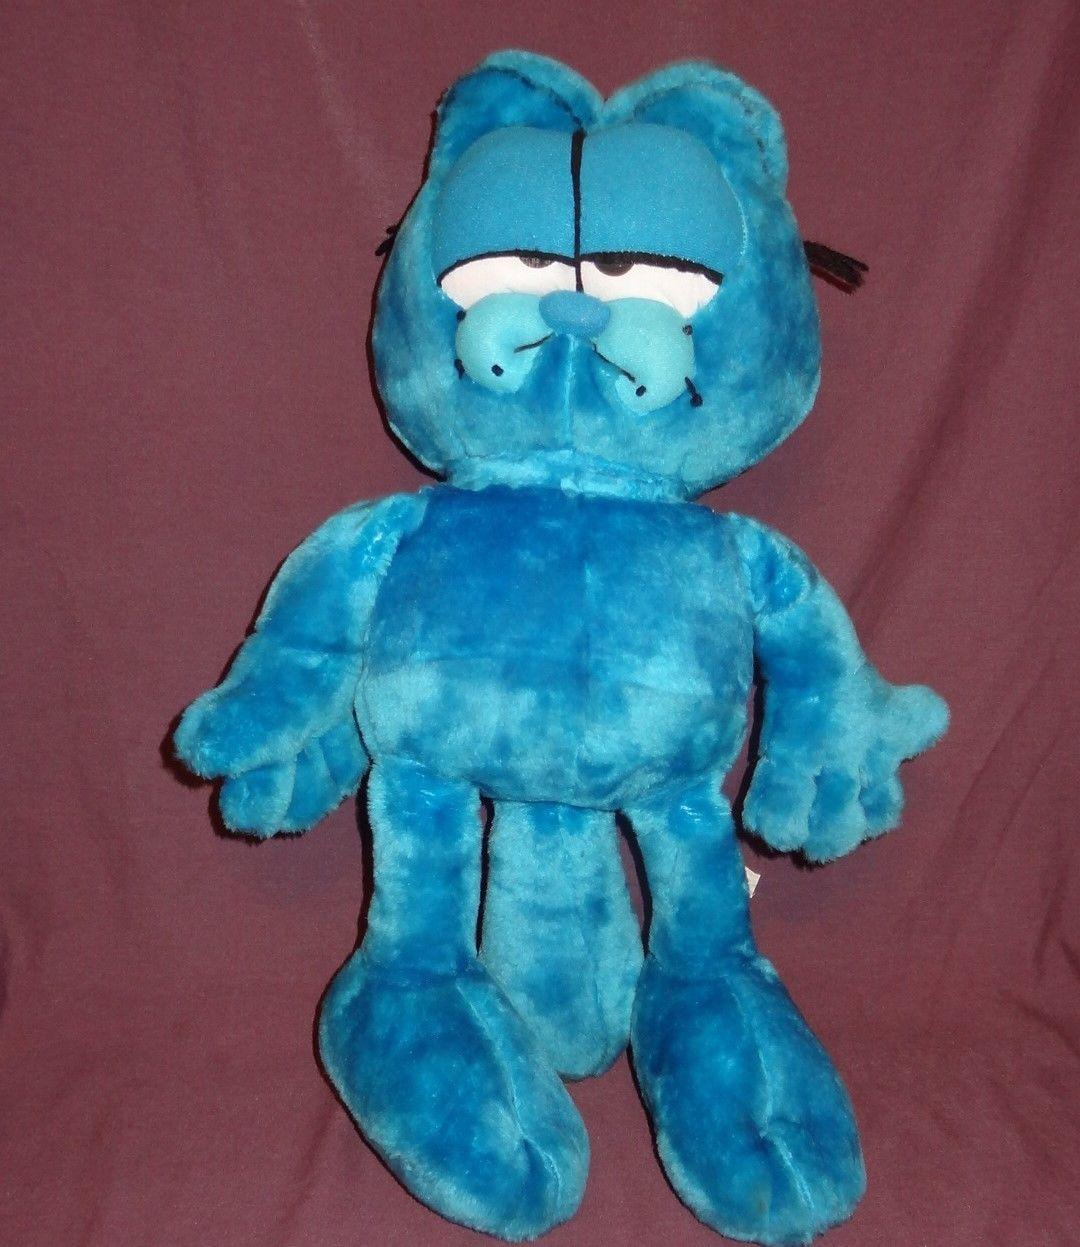 "Garfield Blue Plush Stuffed Animal 22"" Styrofoam Filled"